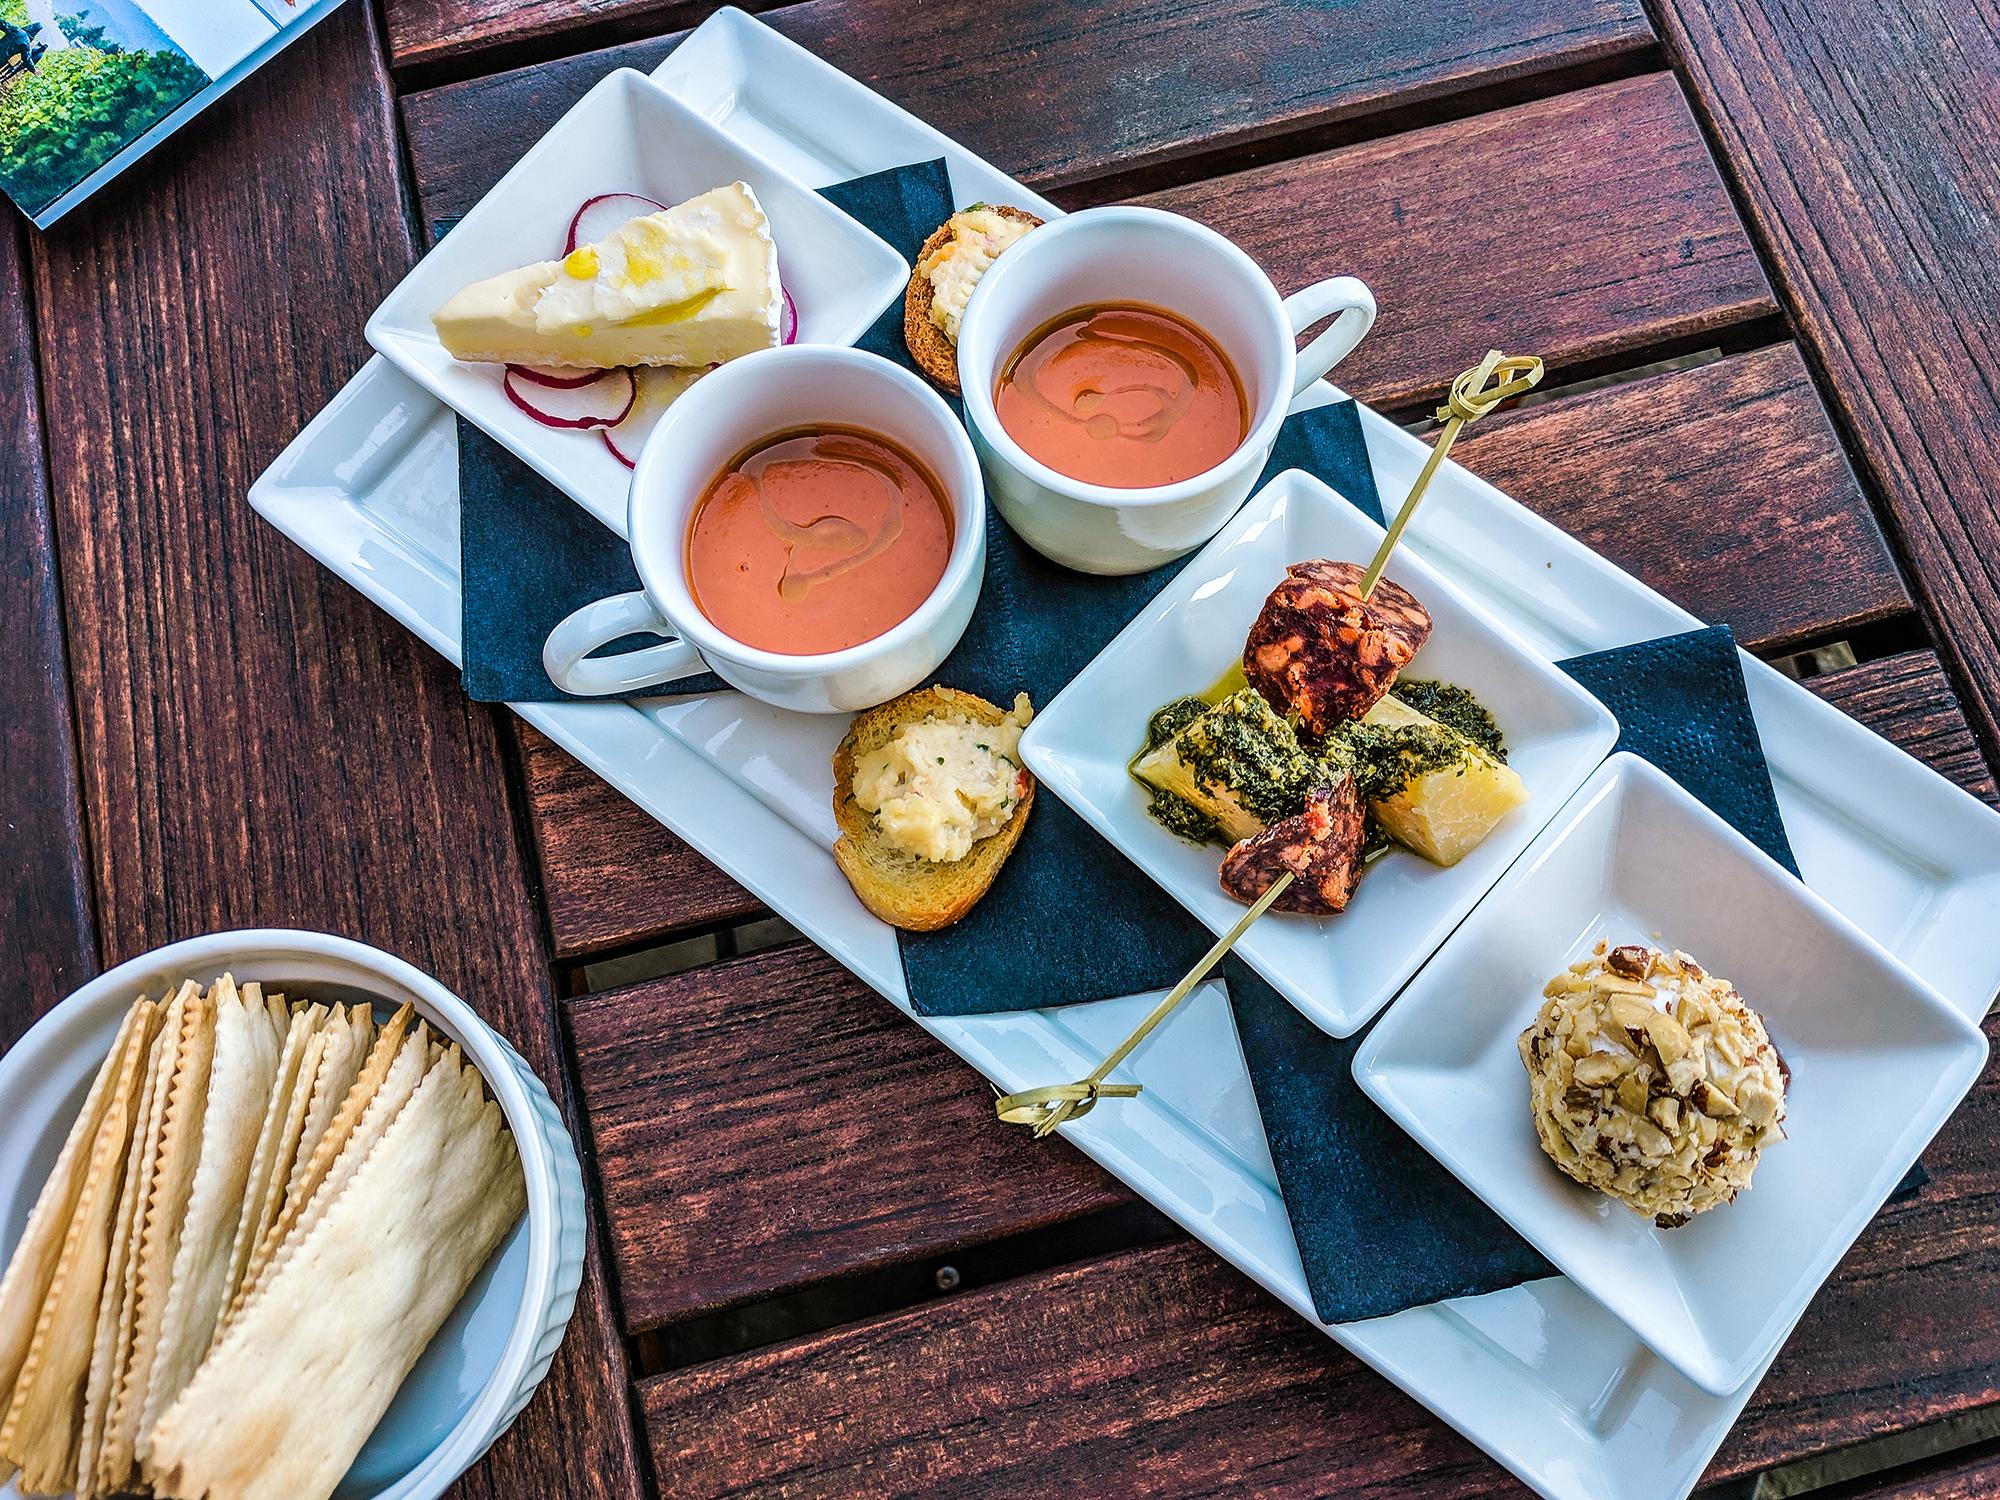 Adelsheim tasting spread